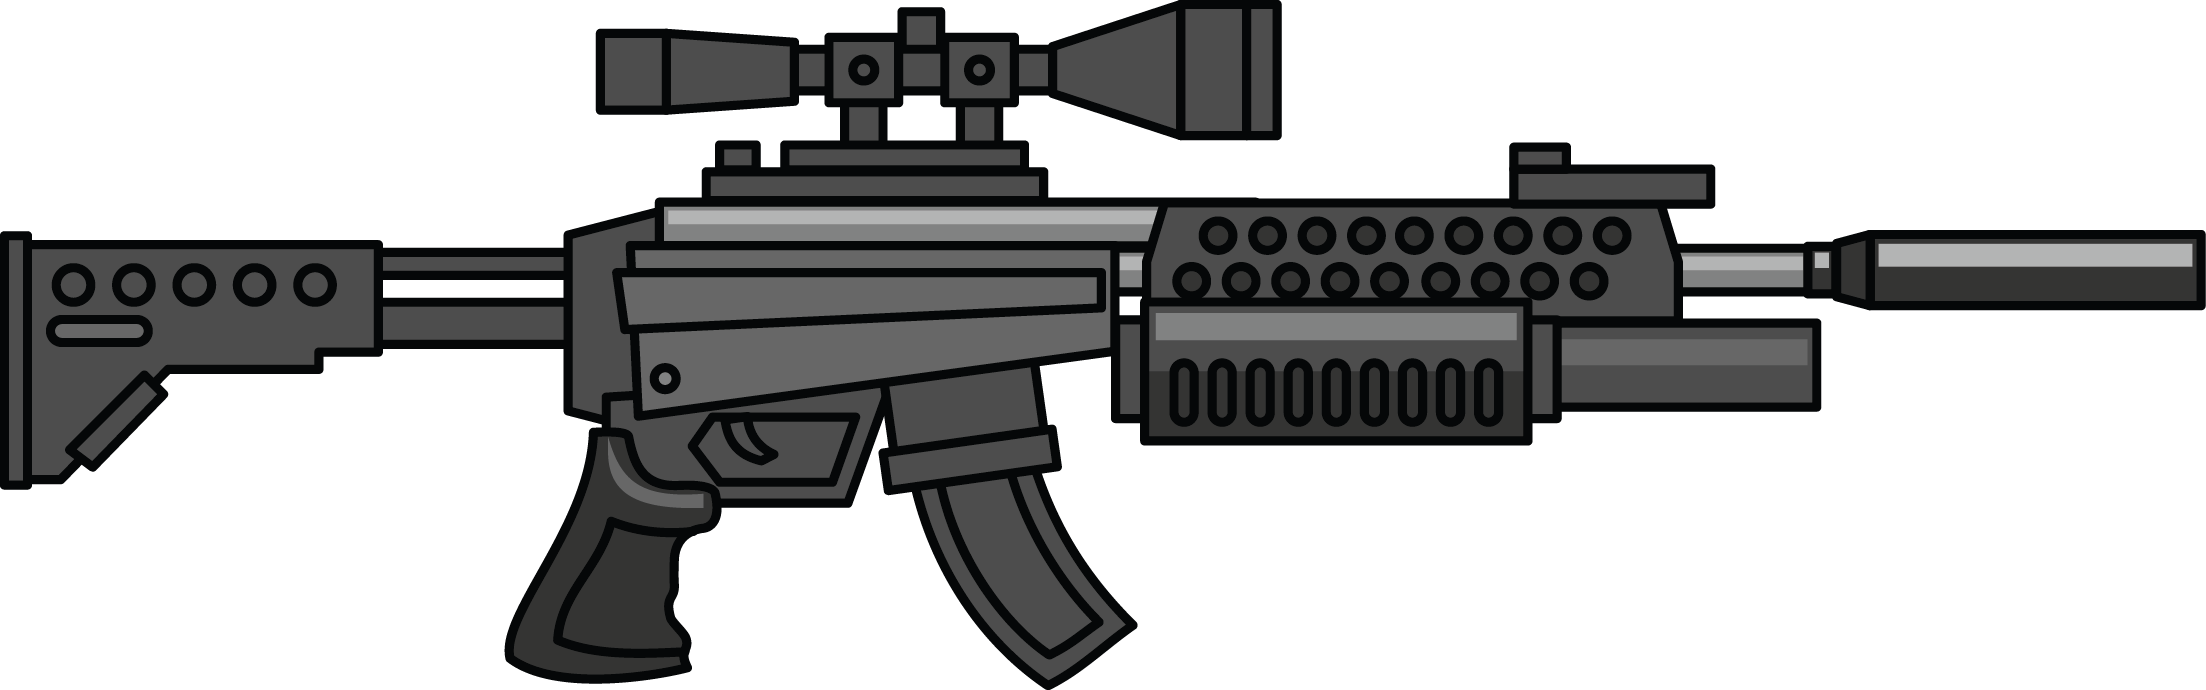 Snipers clipart transparent Clip art image Gun military